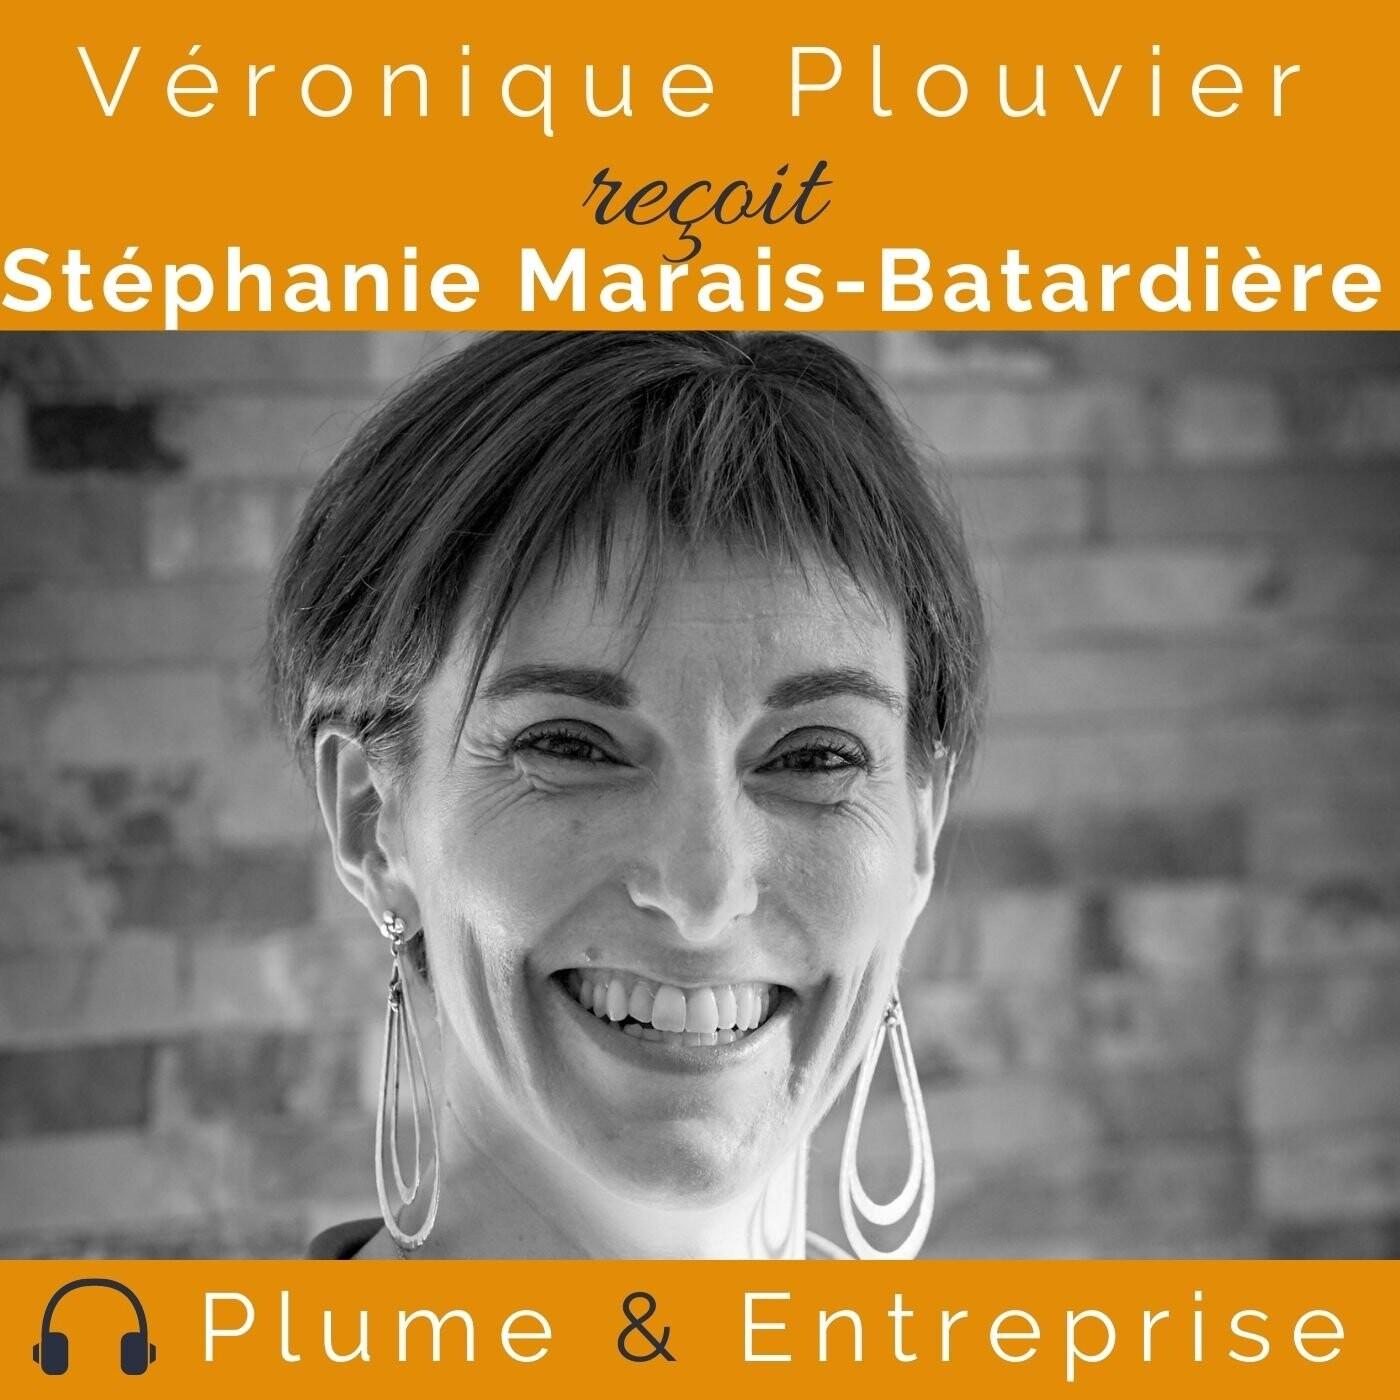 # 39 Stéphanie Marais-Batardière, avocate fiscaliste